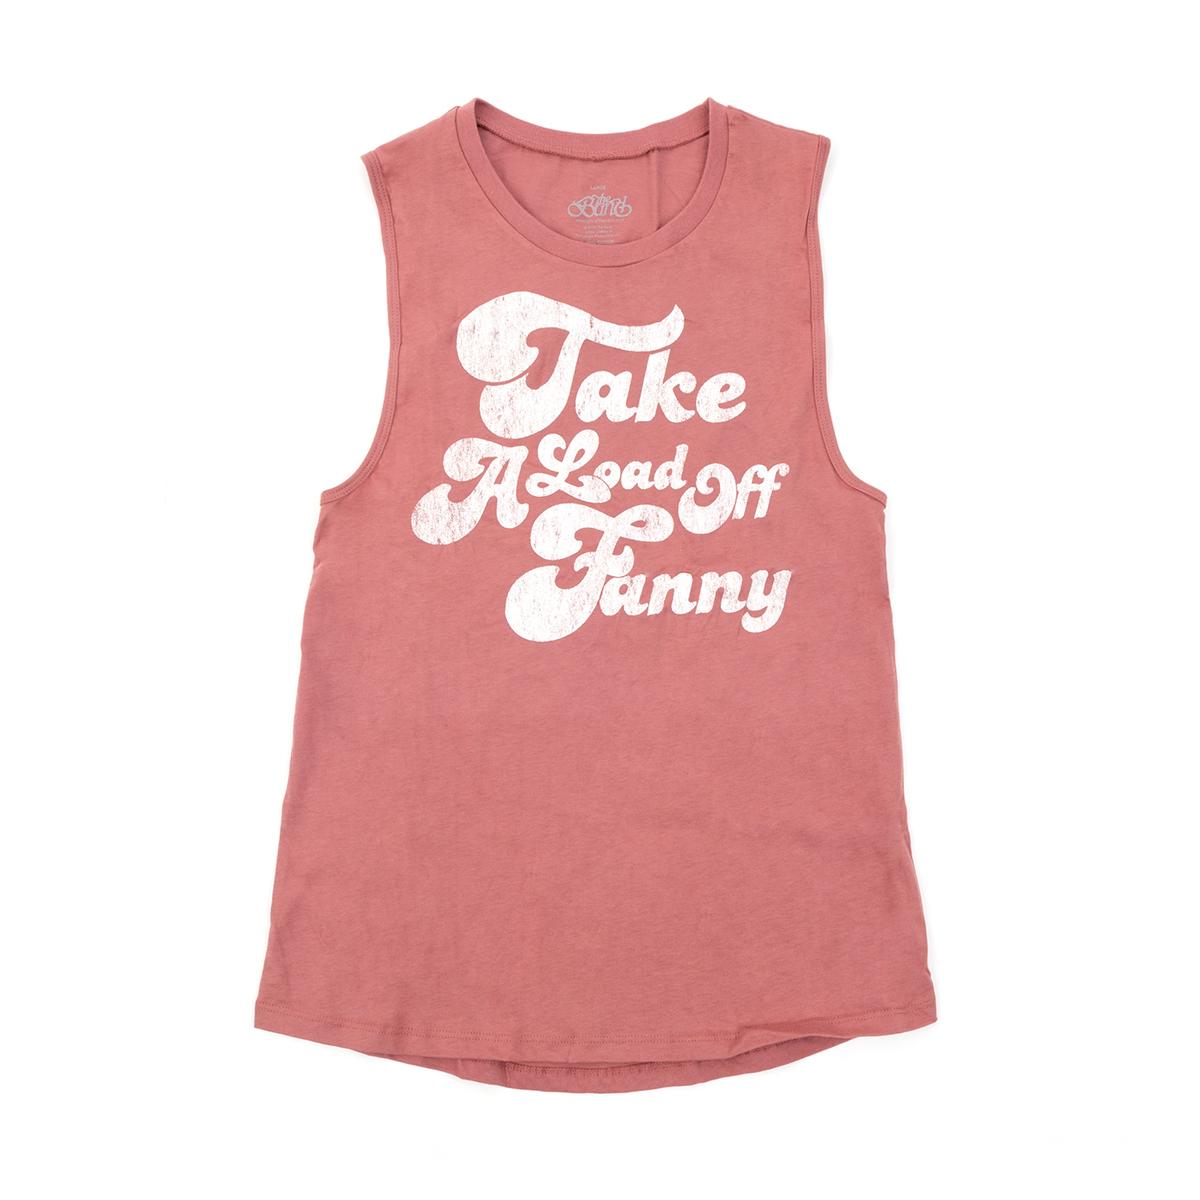 Take A Load Off Fanny Womens Tank